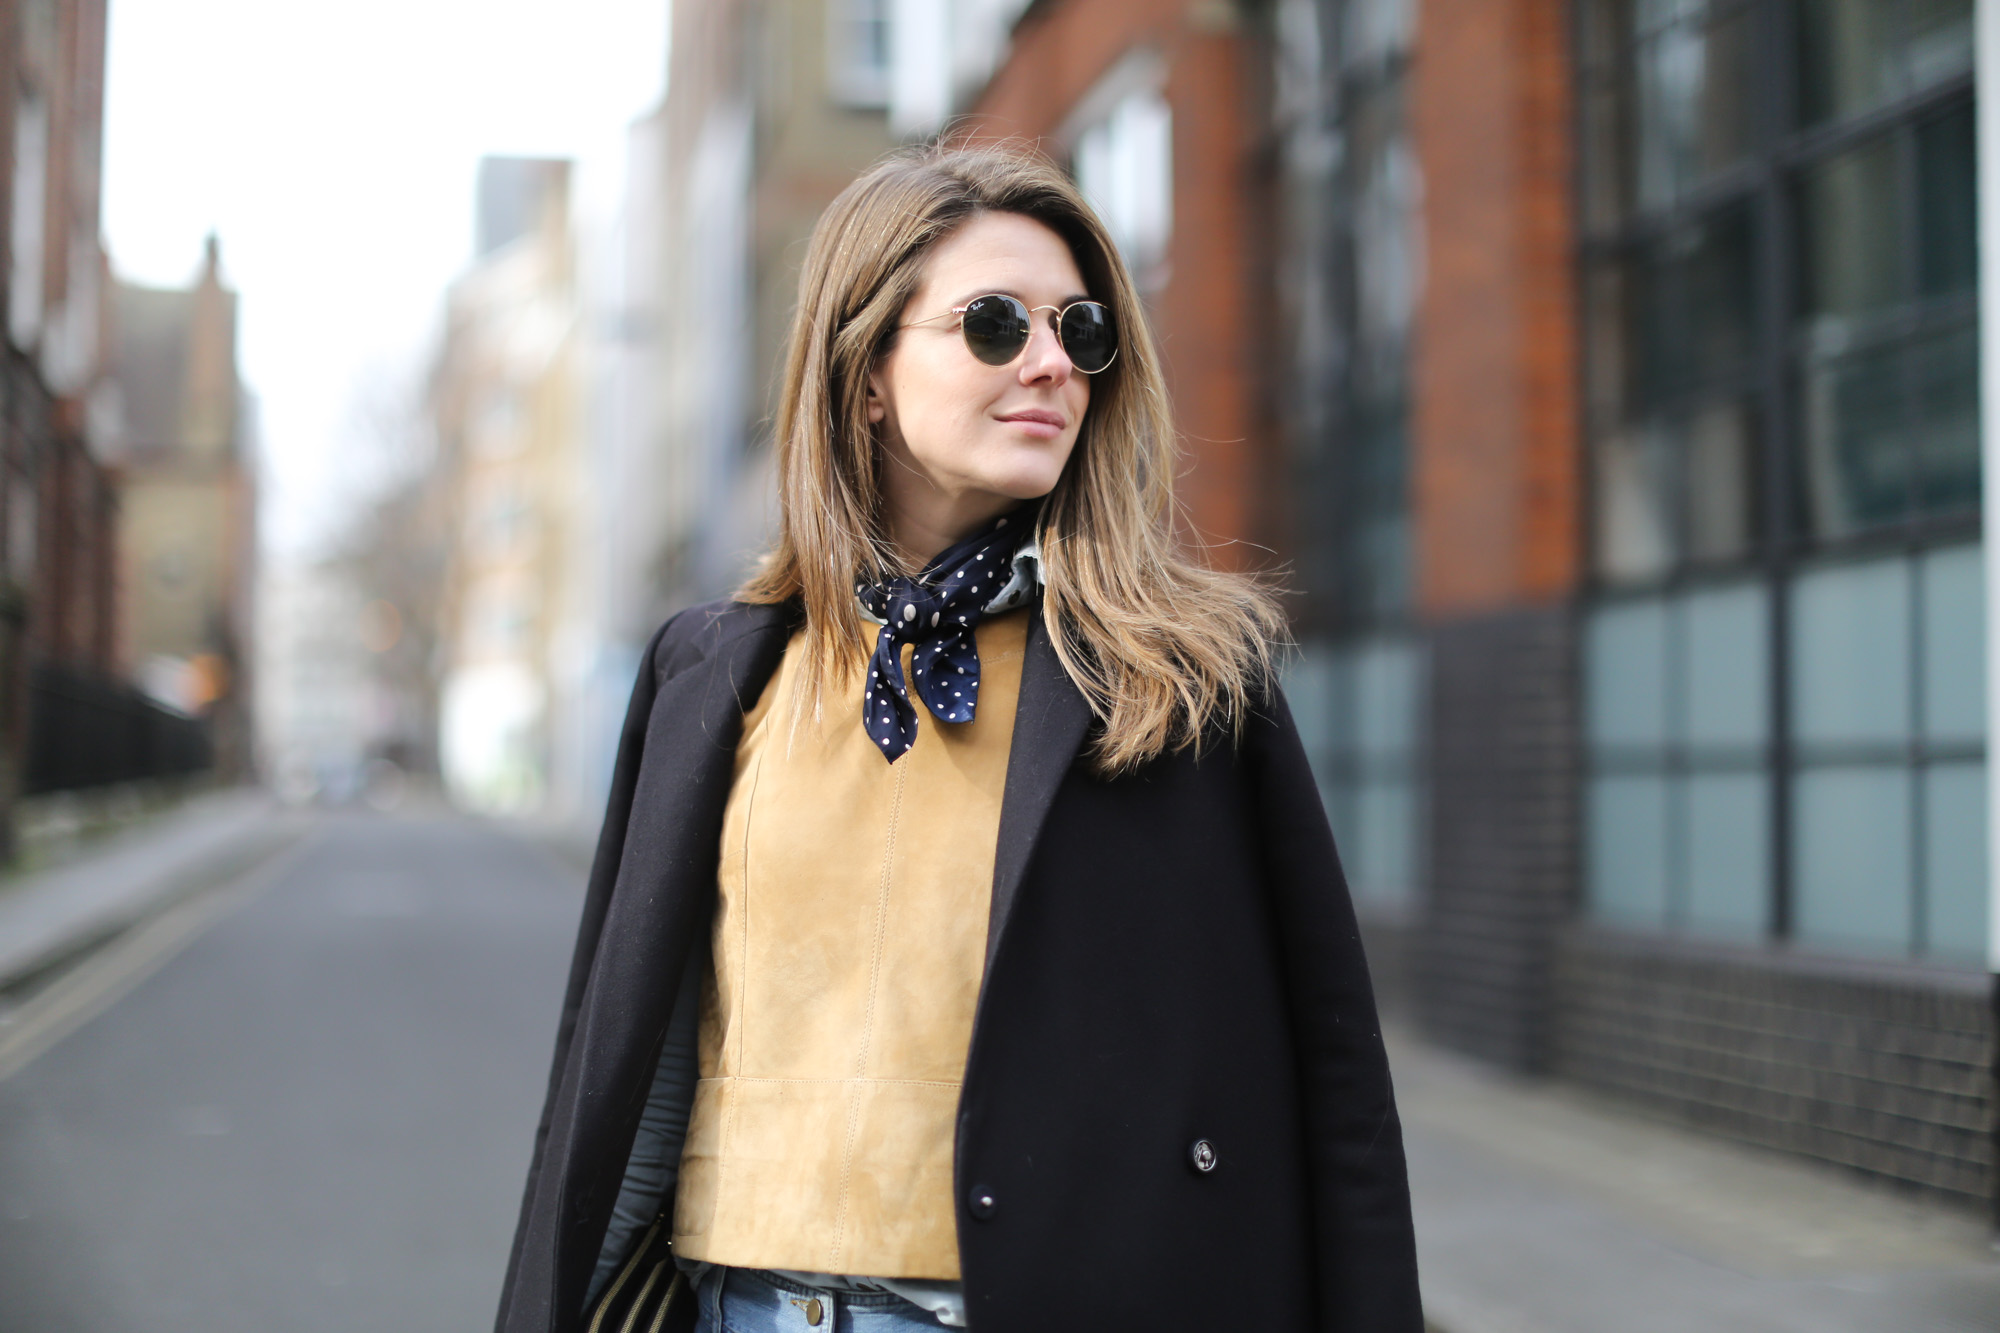 Clochet-wide-retro-jeans-suede-top-cos-coat-4